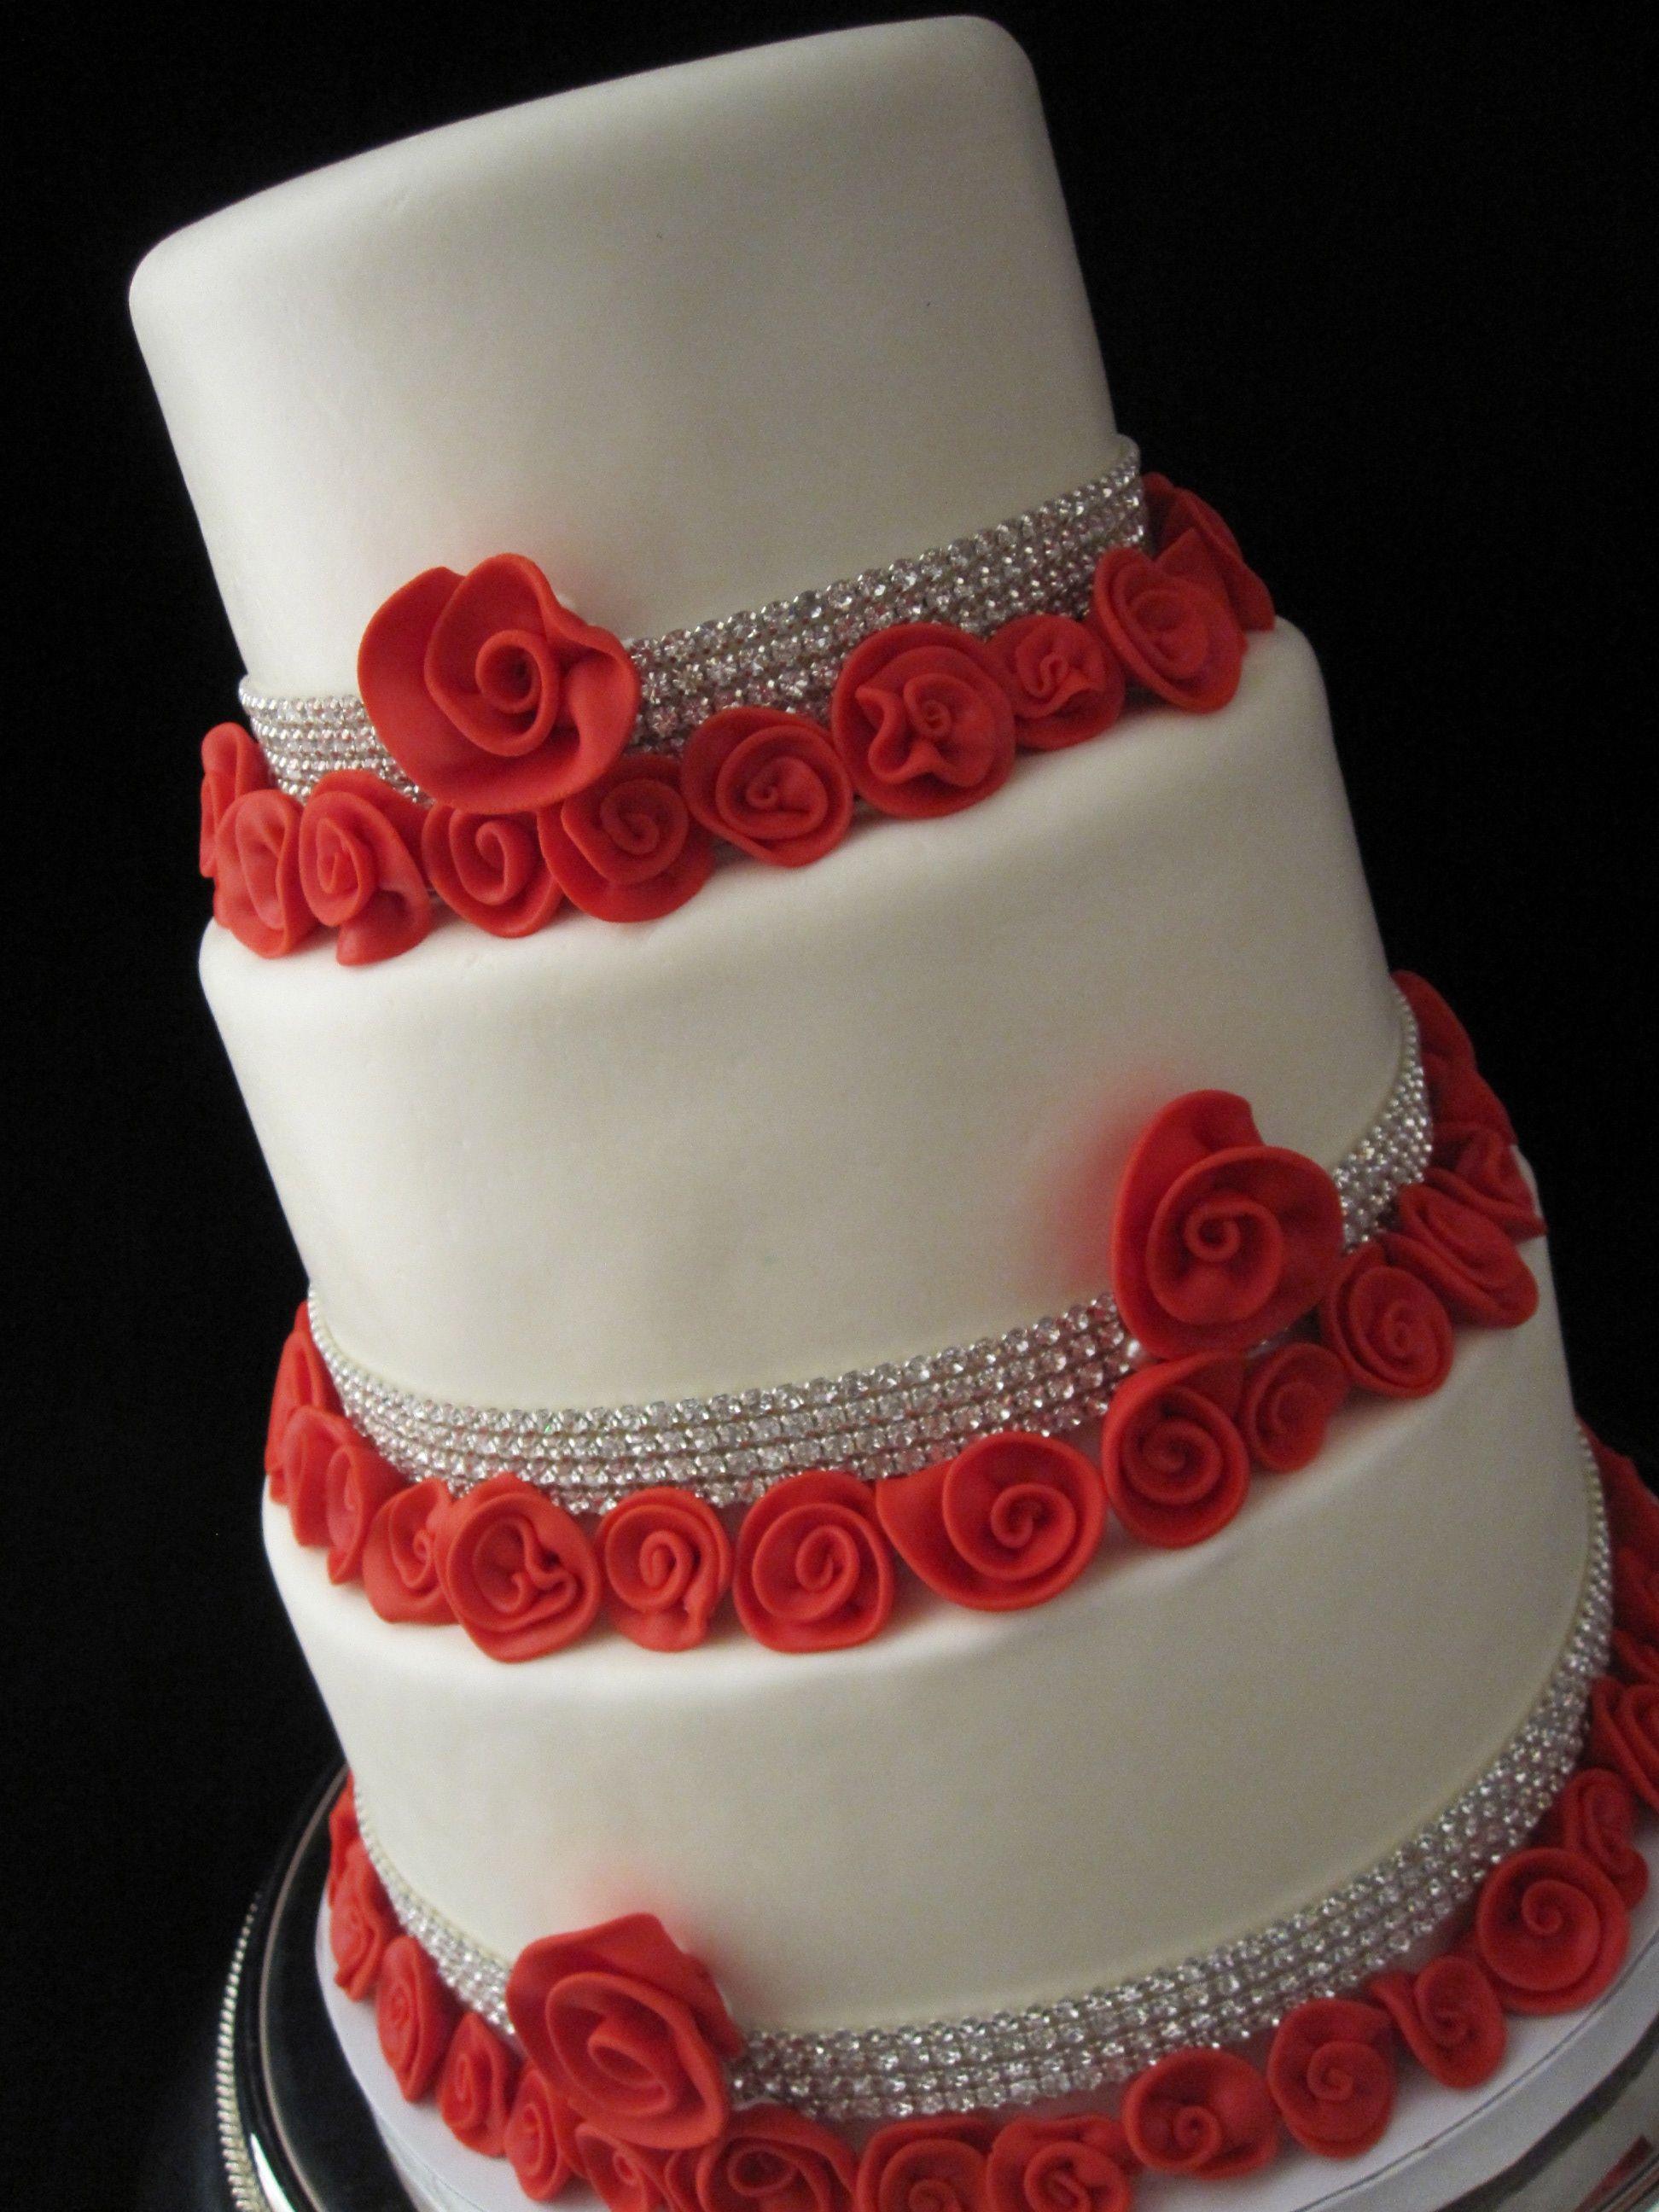 White wedding cake red roses with rhinestones lexington kentucky white wedding cake red roses with rhinestones lexington kentucky junglespirit Gallery